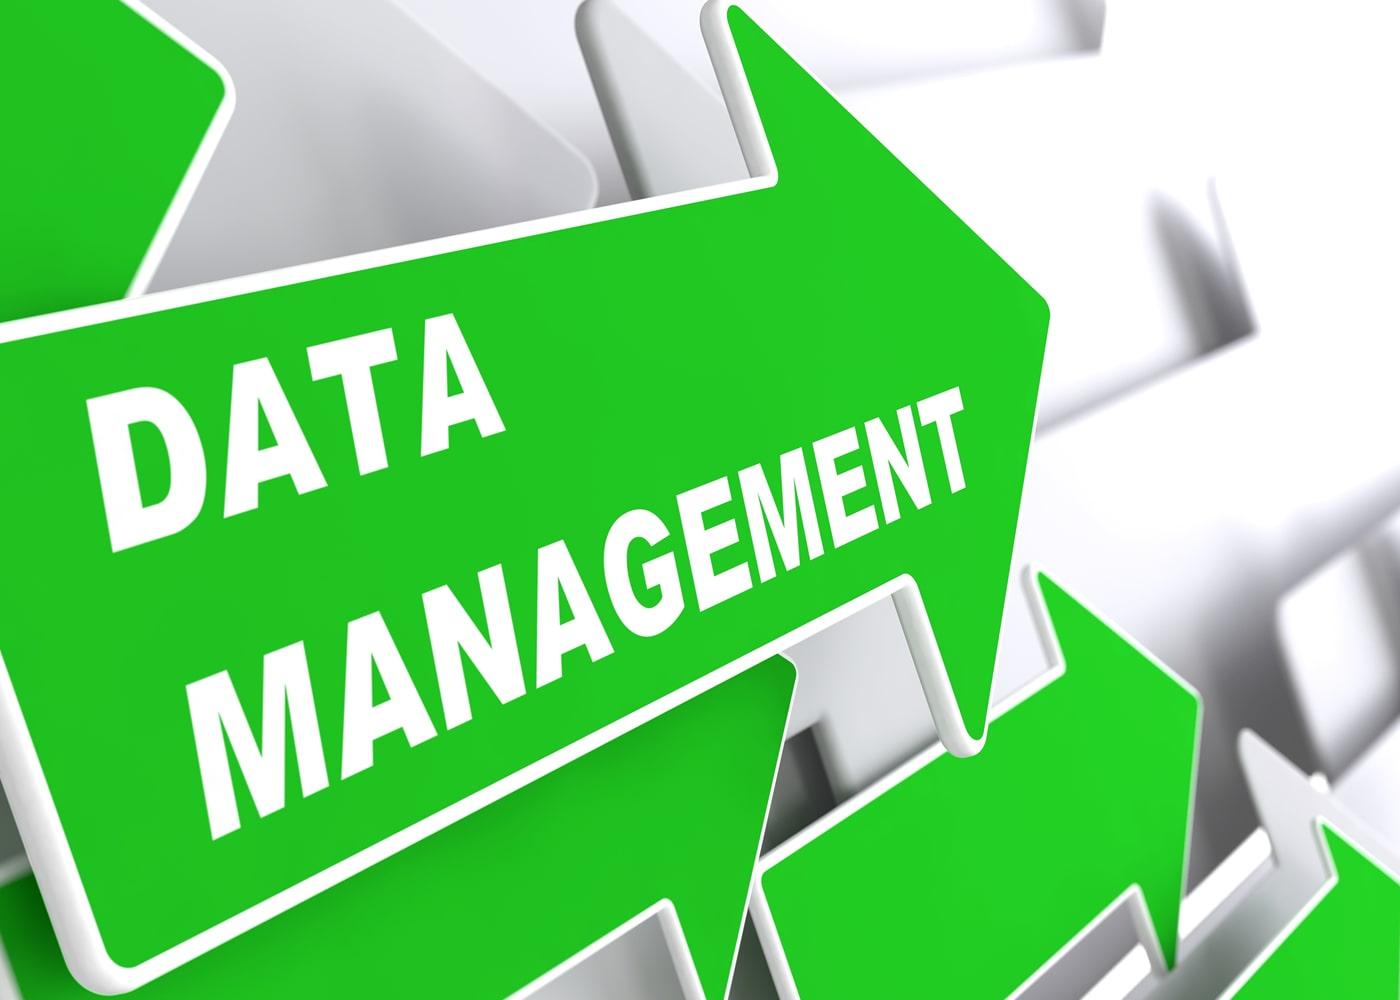 naem-2018-blog-data-management-internet-concept-green-arrow-700x500